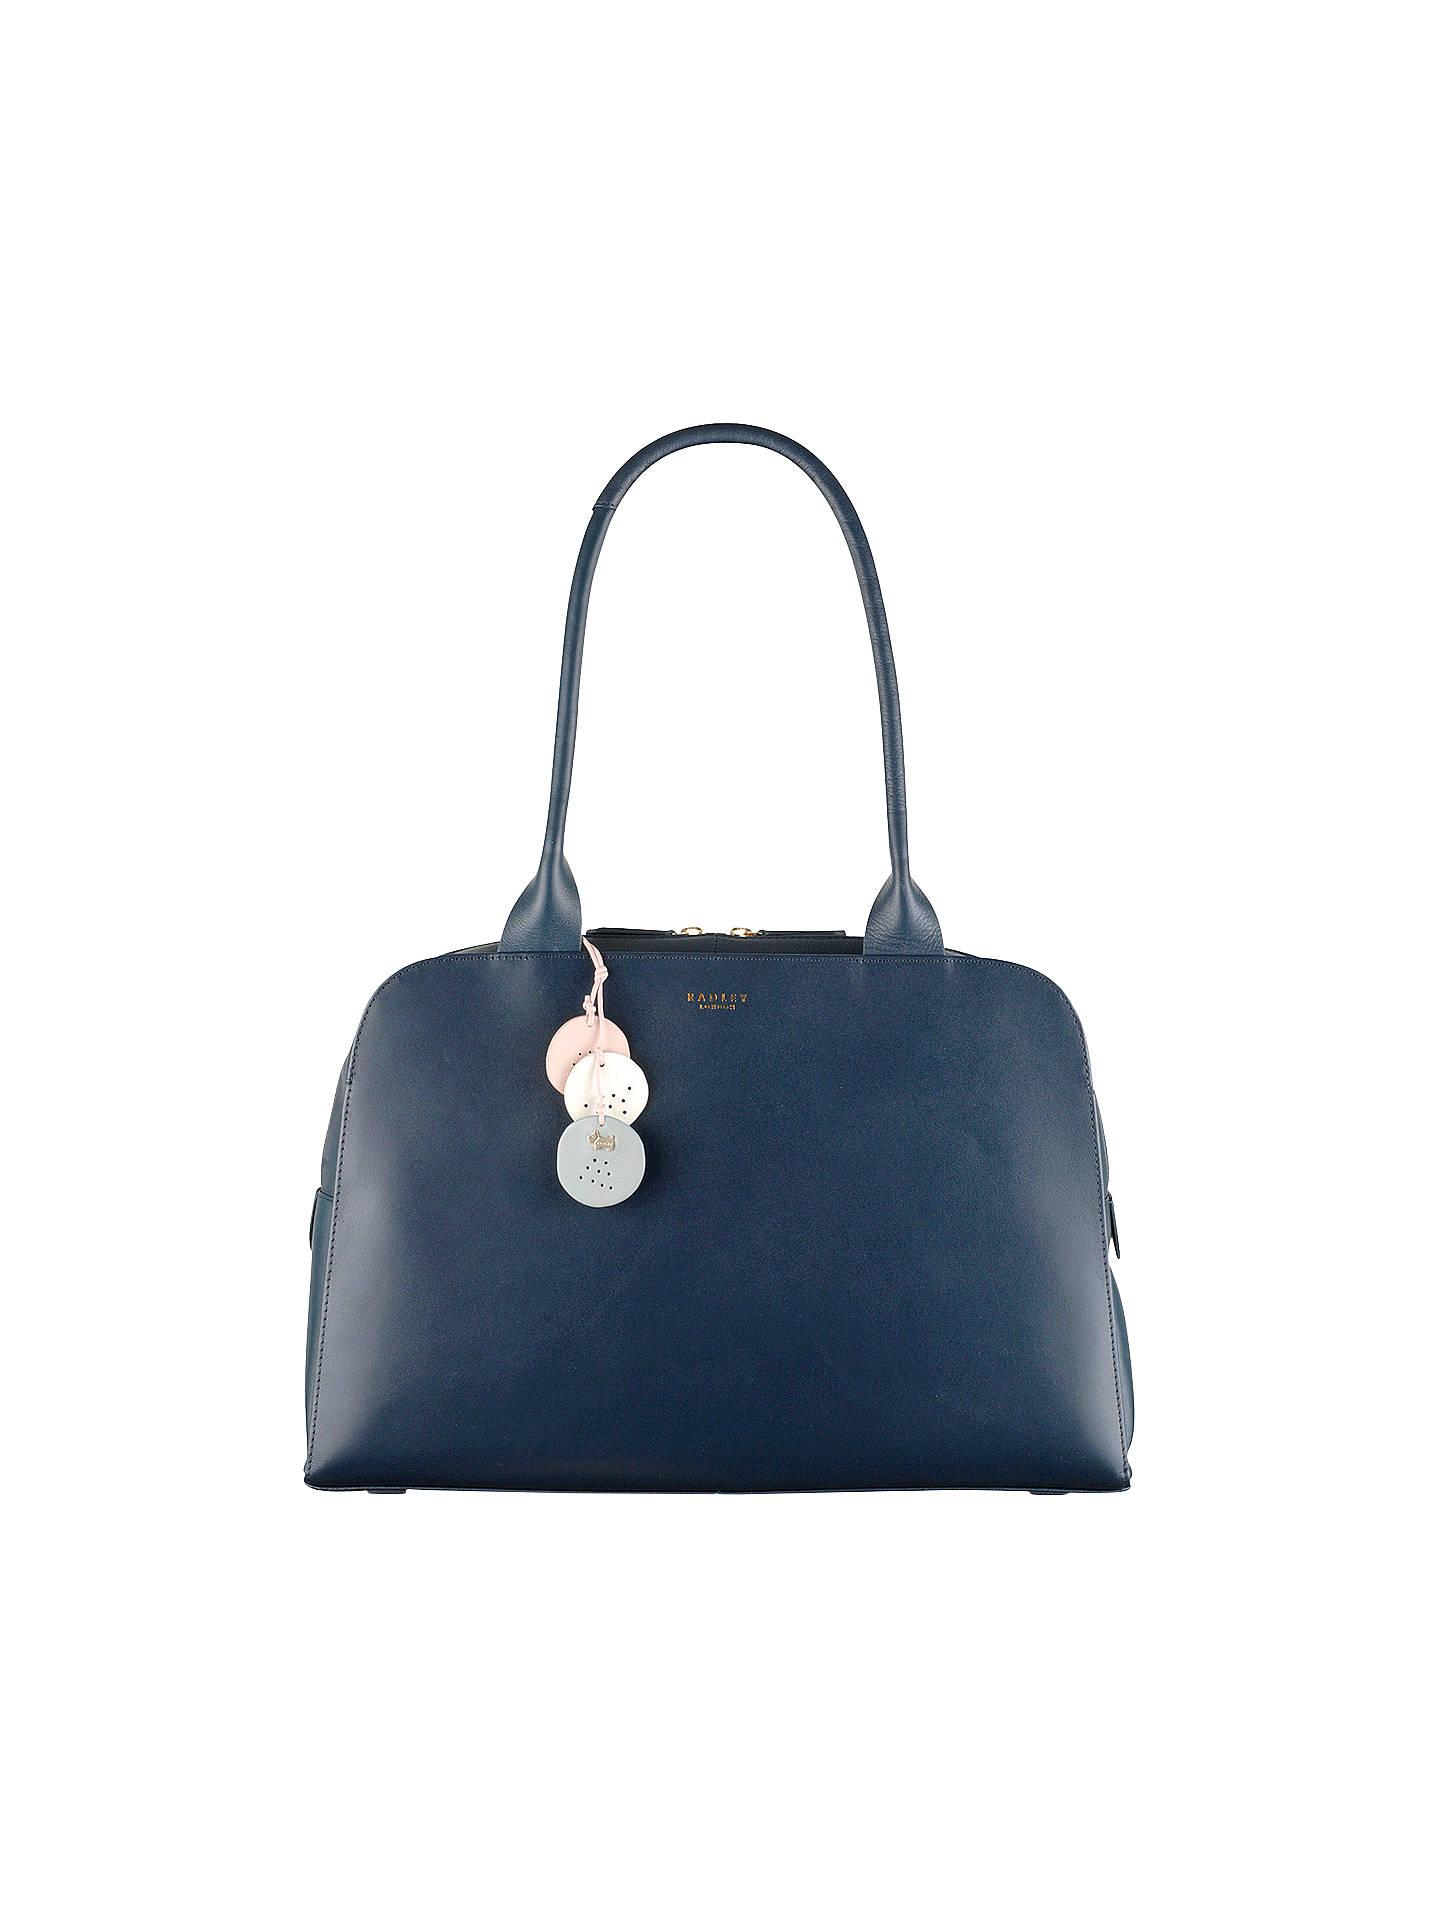 5a58fb15bdc Buy Radley Millbank Leather Large Tote Bag, Blue Online at johnlewis.com ...